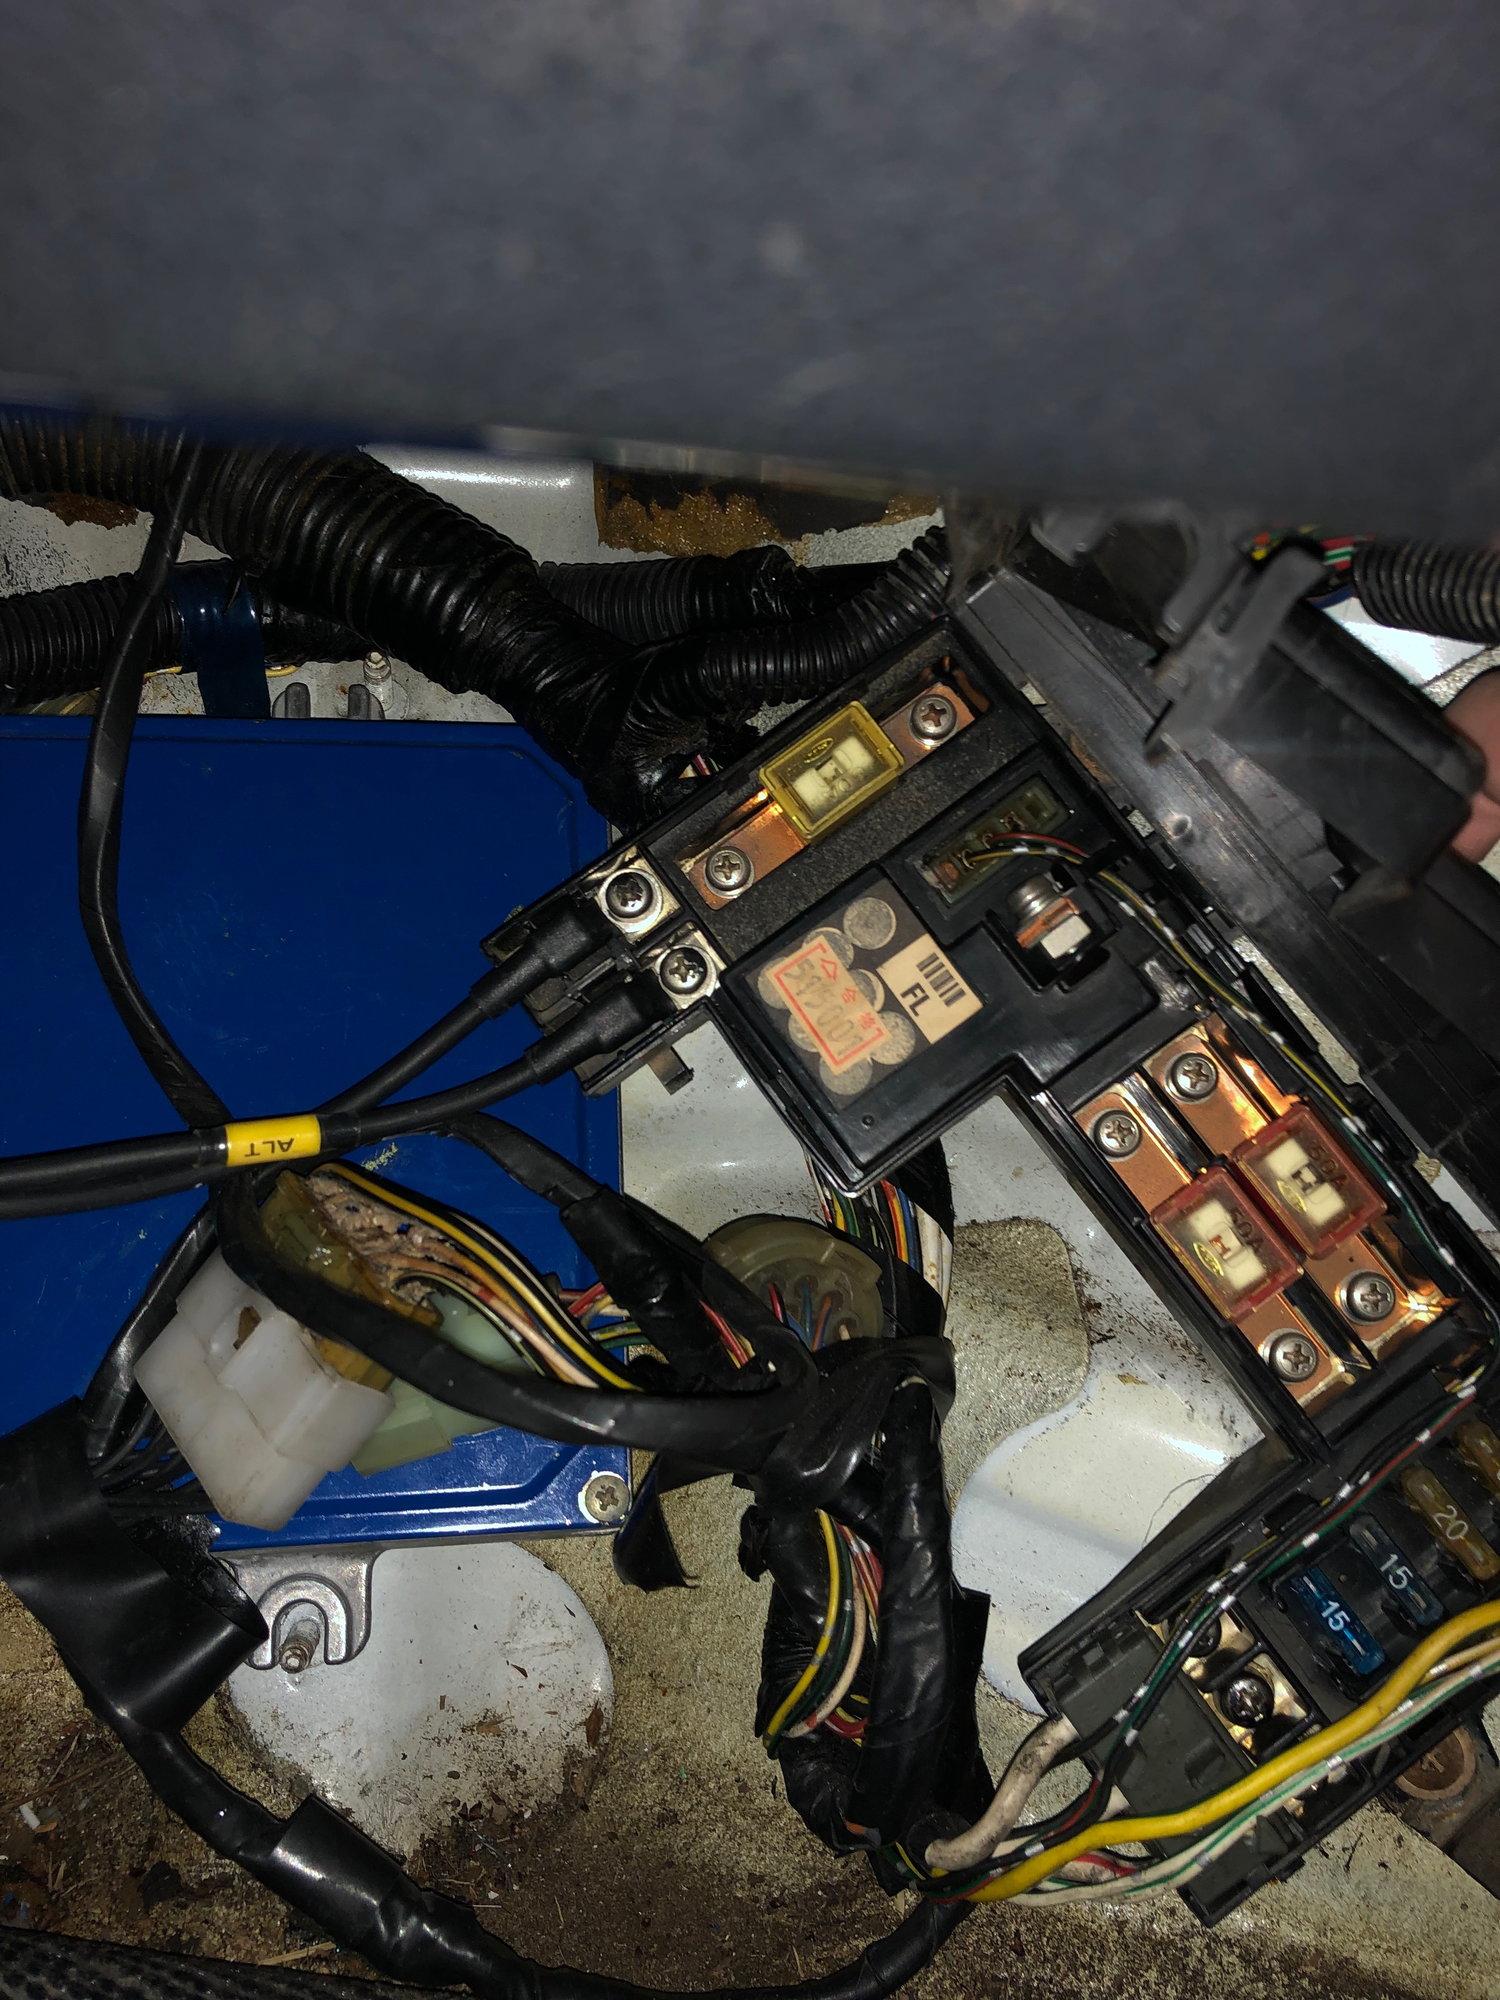 [DIAGRAM_0HG]  Fusebox relocation, wire tuck. Crimp or solder? - Honda-Tech - Honda Forum  Discussion   Fuse Box Relocation      Honda-Tech